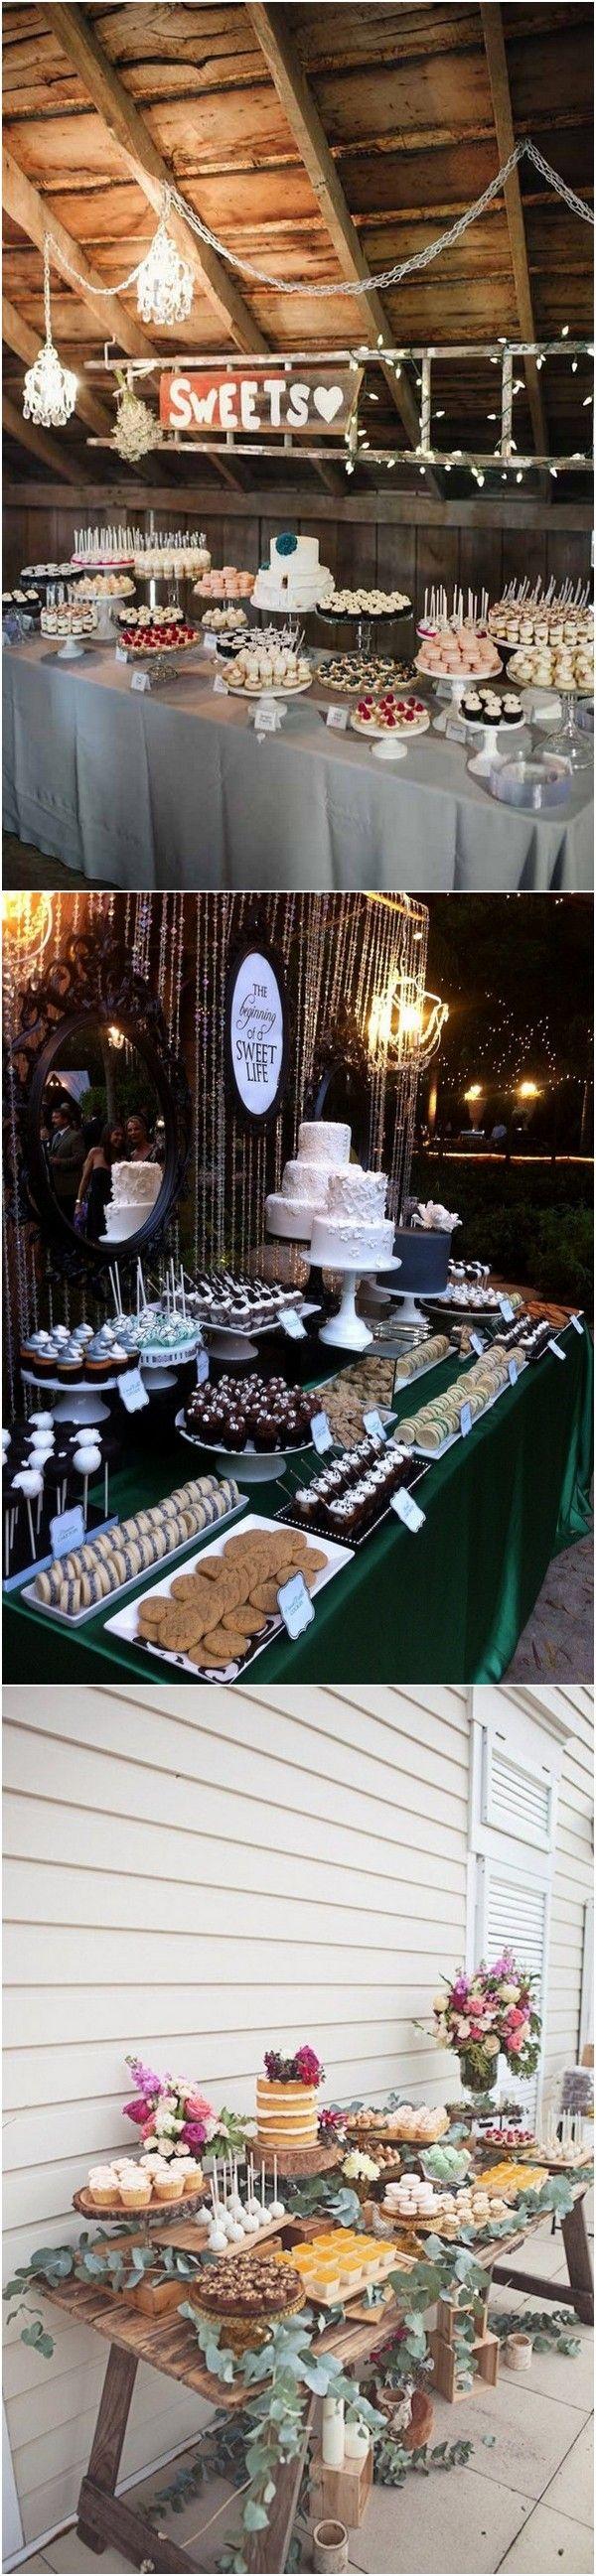 Barn wedding table settings   Country Rustic Wedding Dessert Table Ideas  Rustic wedding